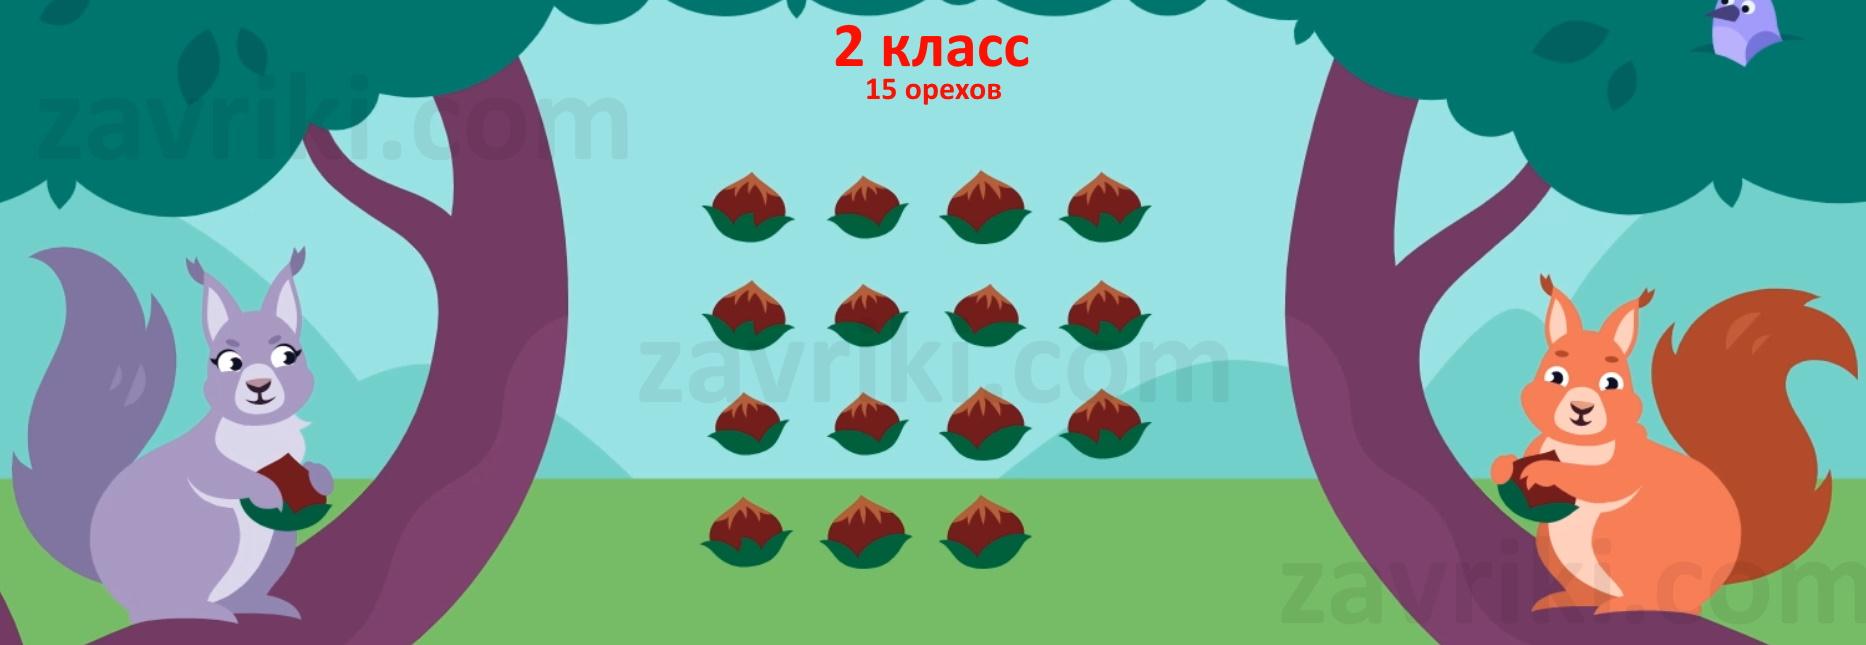 Белки делят орехи 2 класс Учи.ру